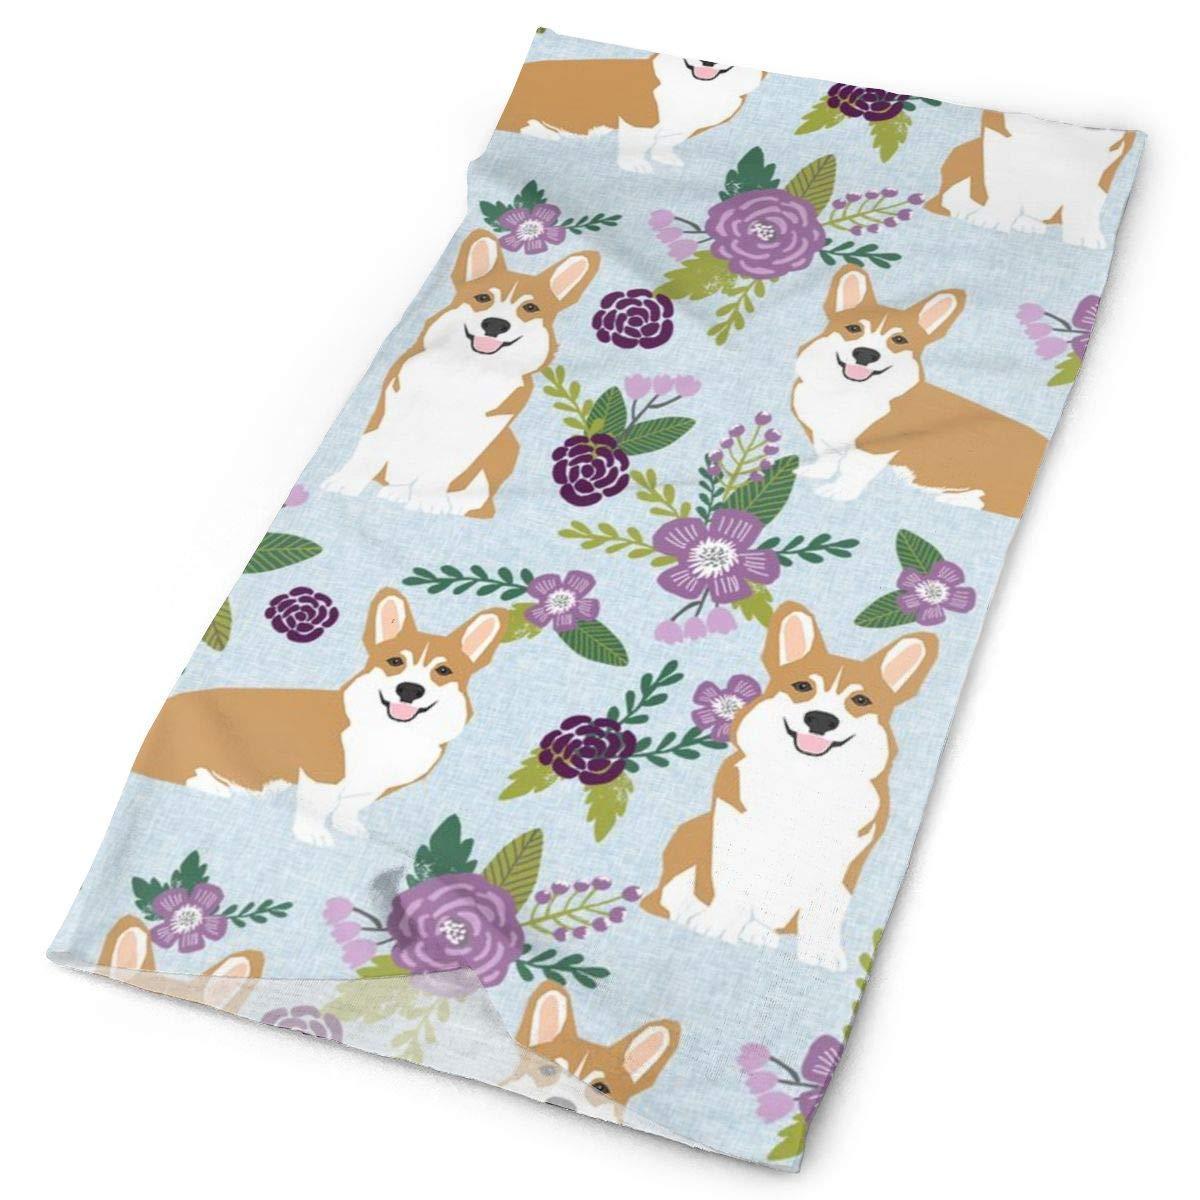 Corgi Christmas Fabric Xmas Corgi Dogs Unisex Bandana Face Mask Warmer Neck Tube for Dust Wind Sun Protection